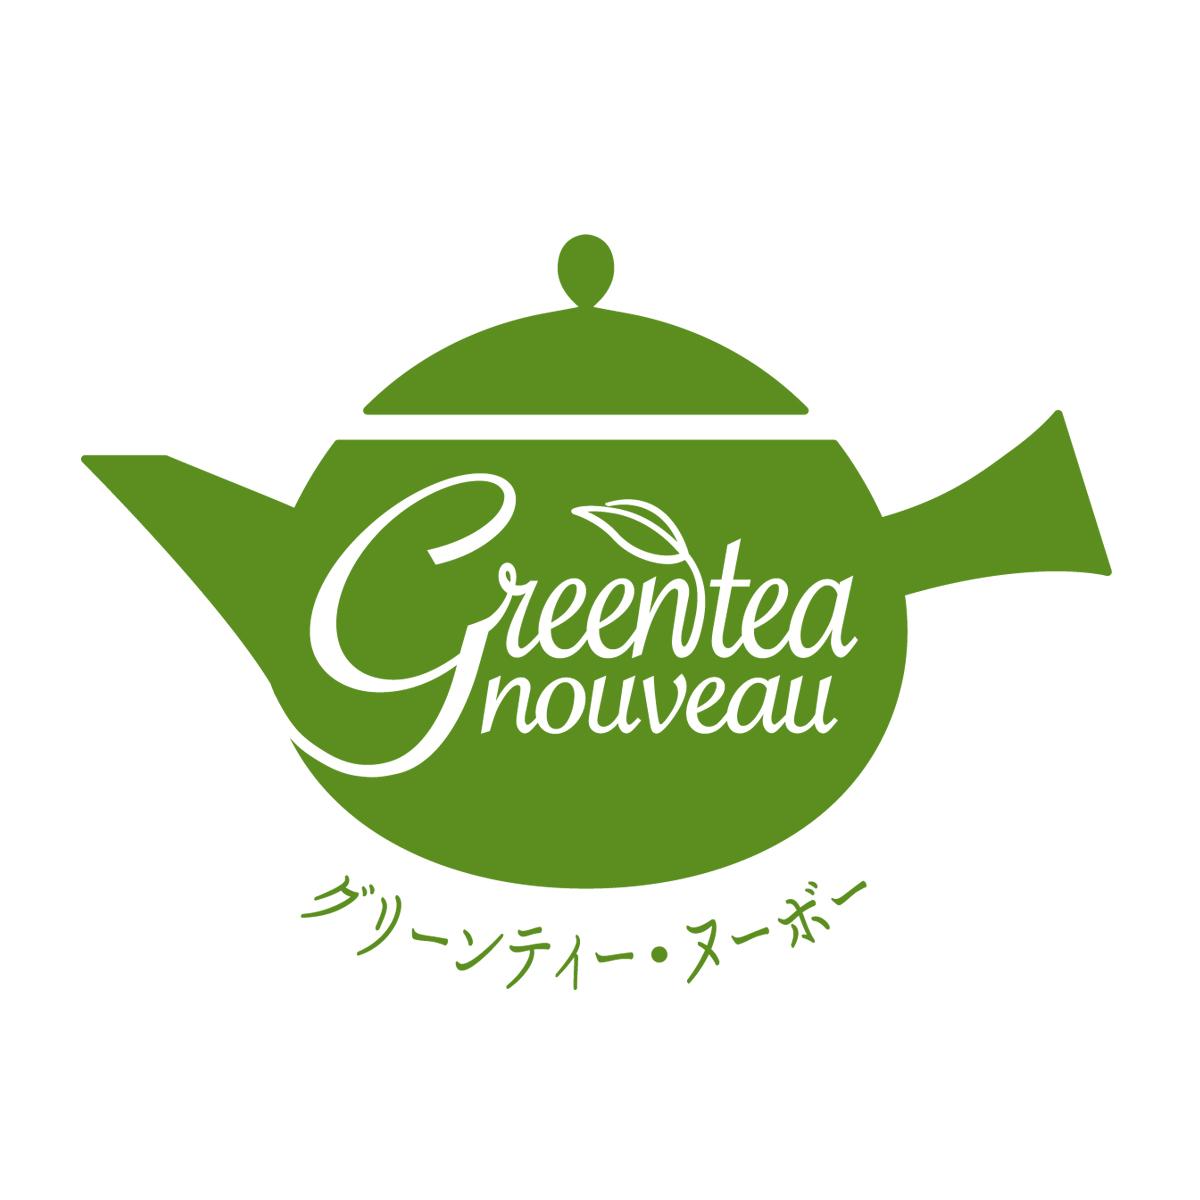 green tea nouveauロゴ